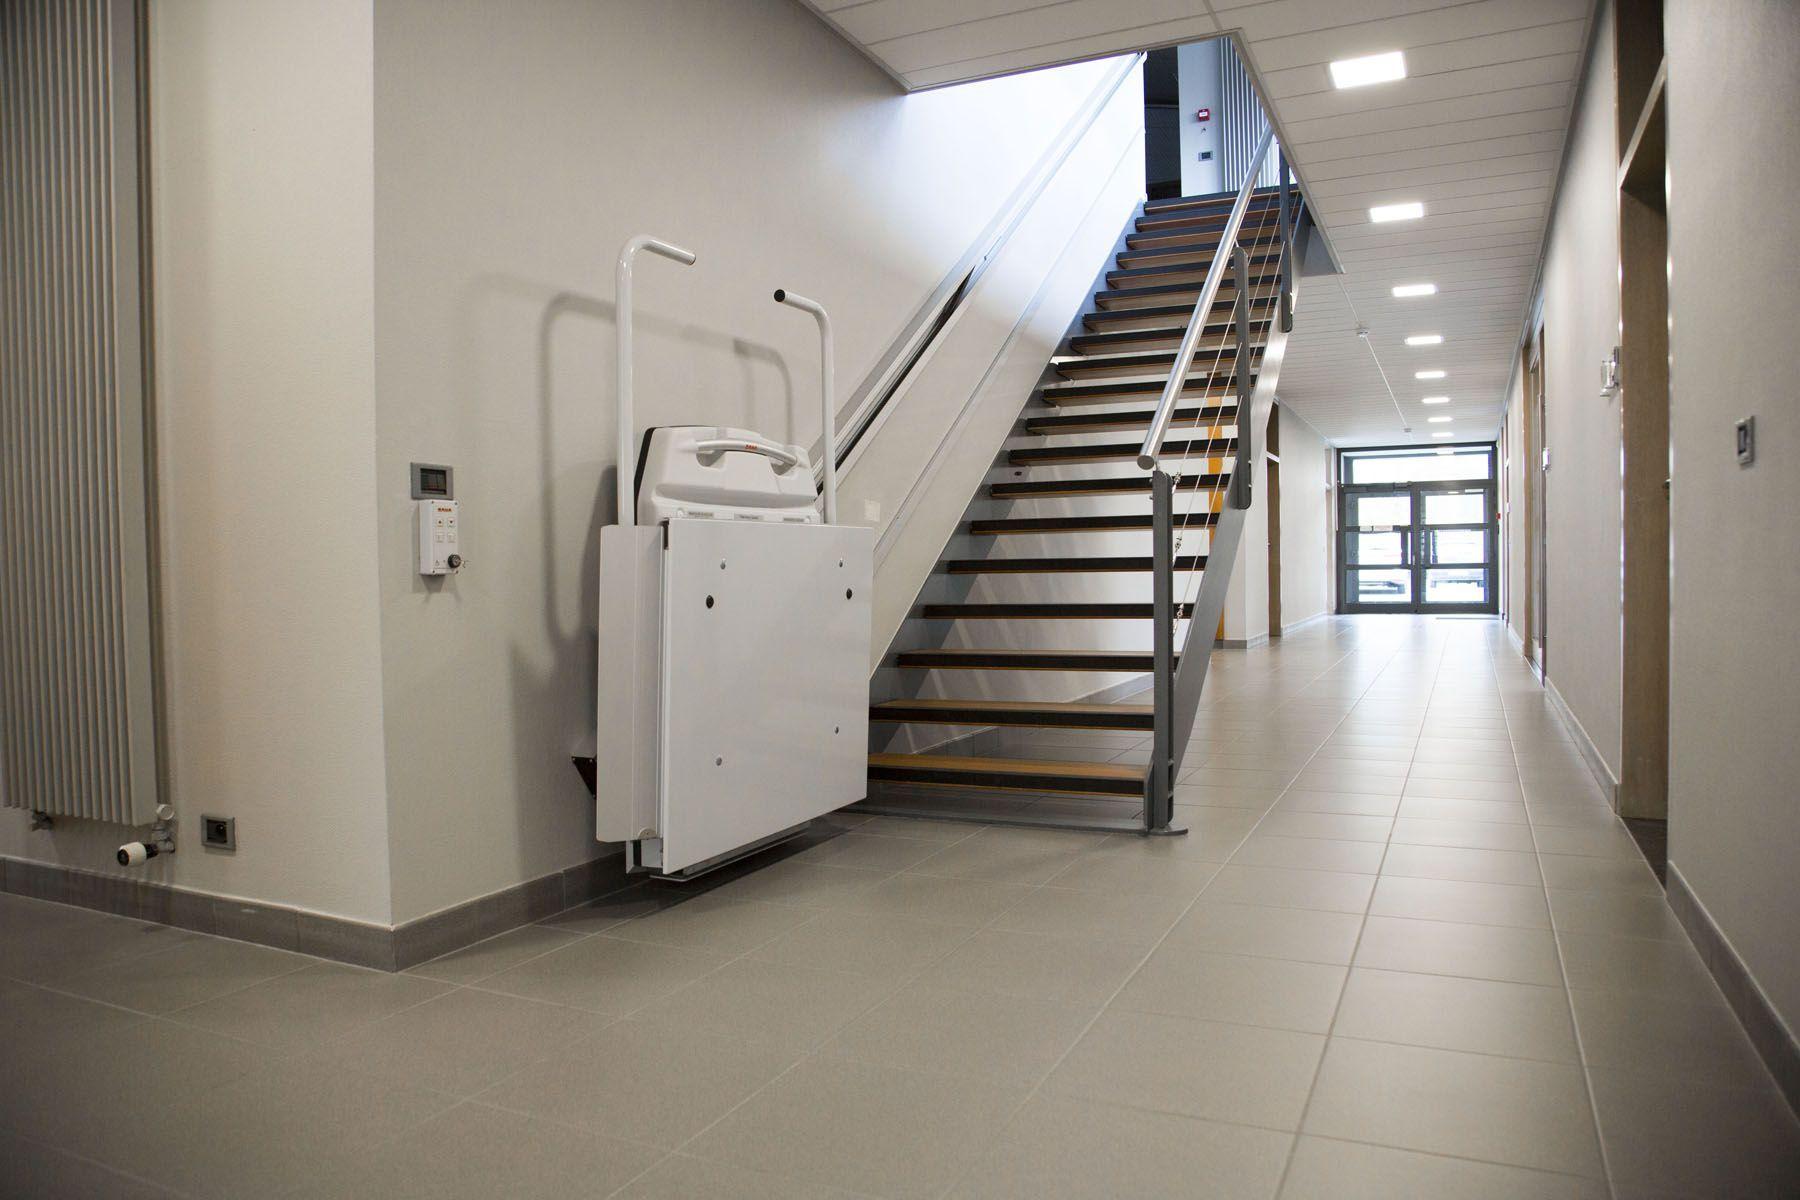 monte escalier belgique